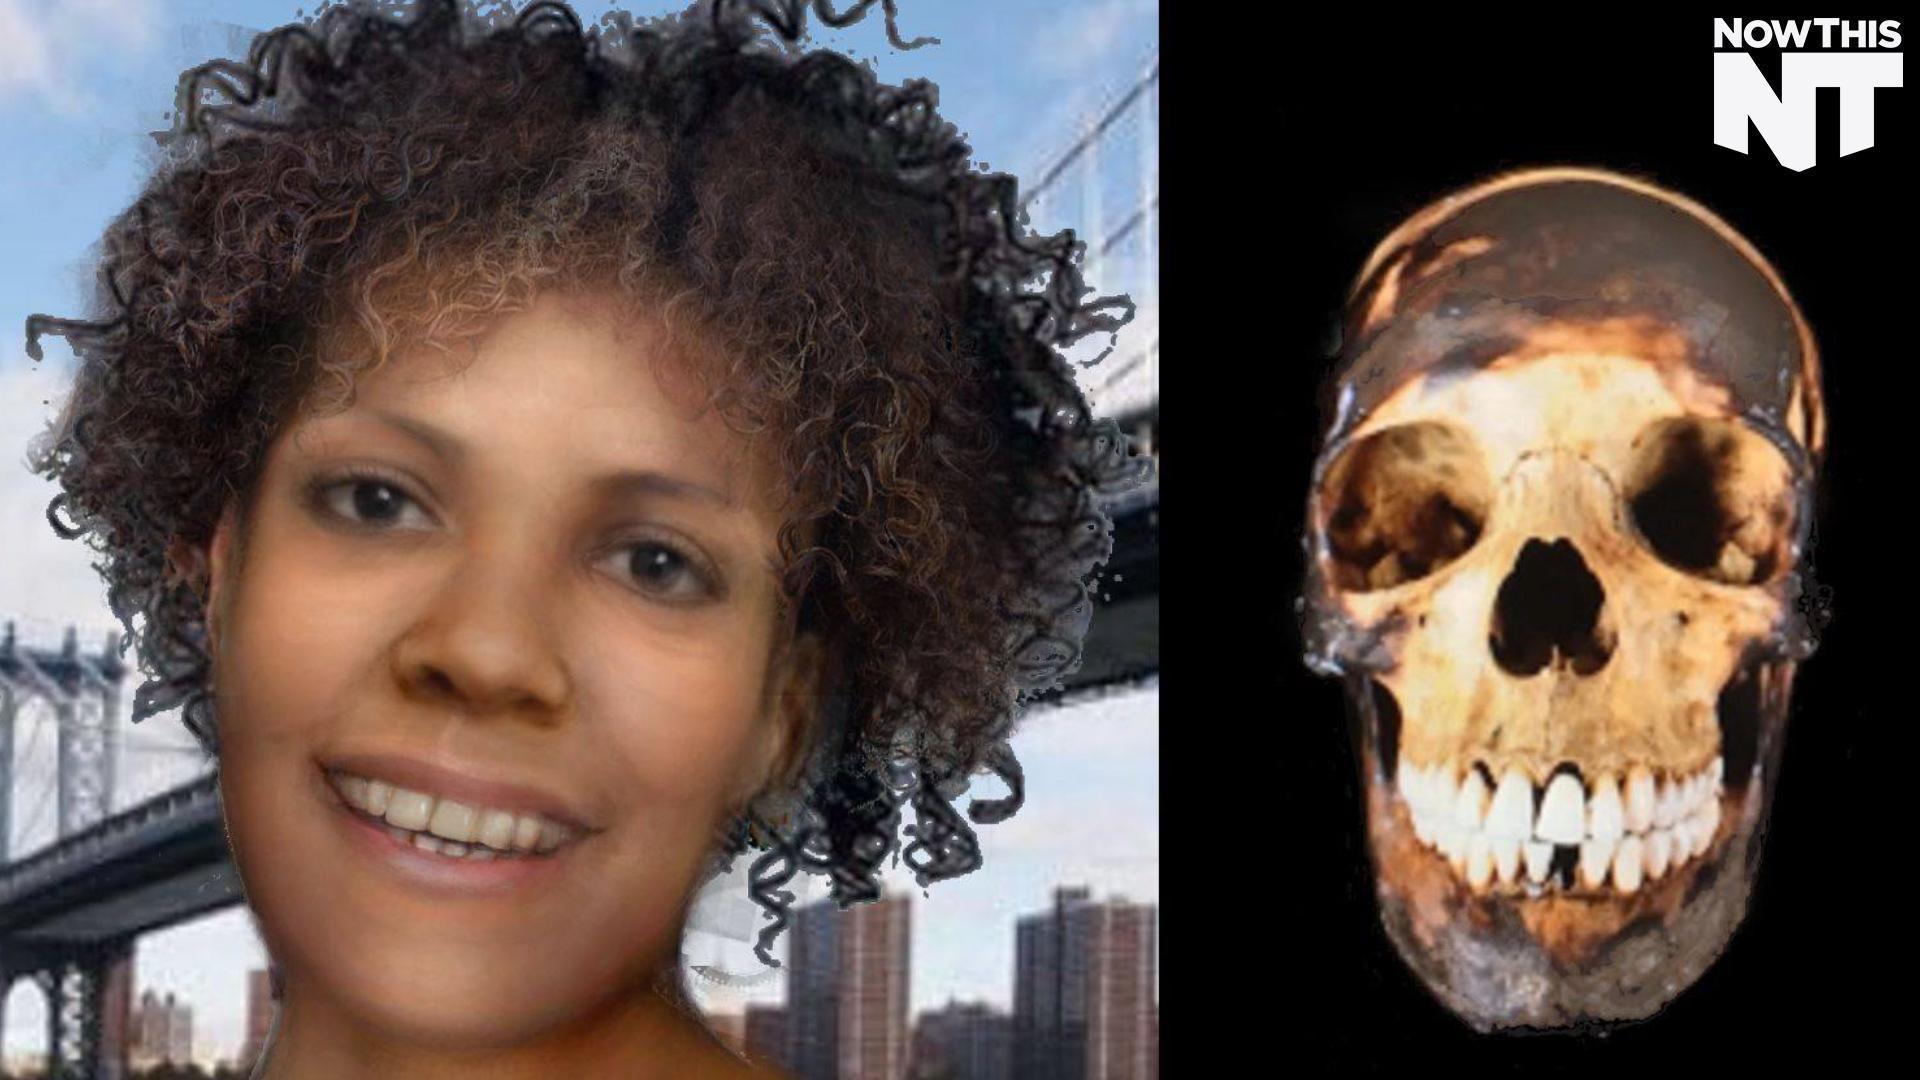 Artist Draws PostMortem Portraits To Help Identify Dead Bodies